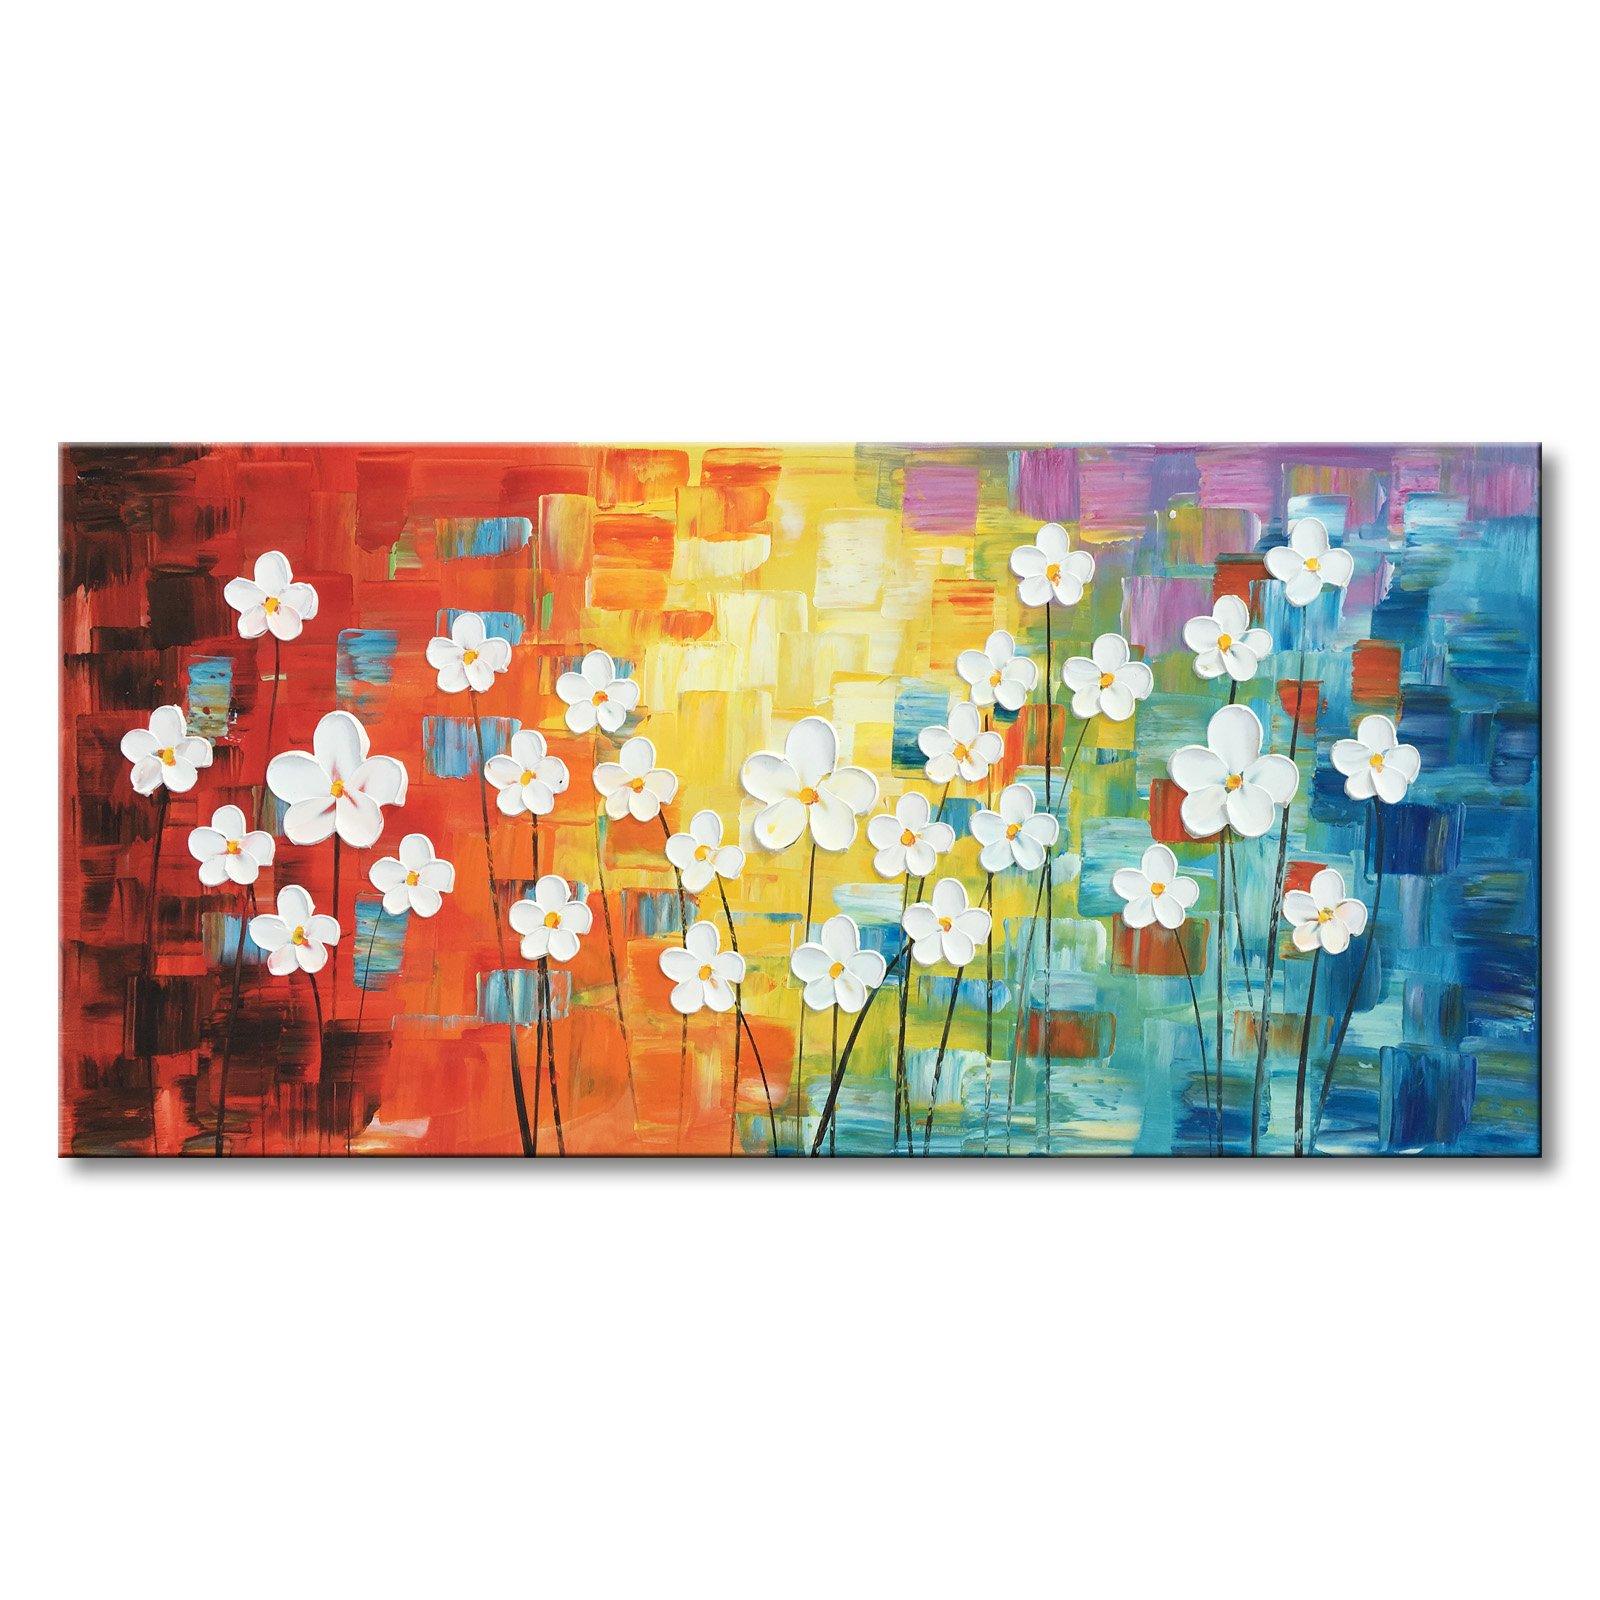 Konda Art -Framed Modern 100% Hand-painted Flower Art Wall Decor Canvas Oil Painting Textured White Color Petal Decor Gift (60''W x 30''H)